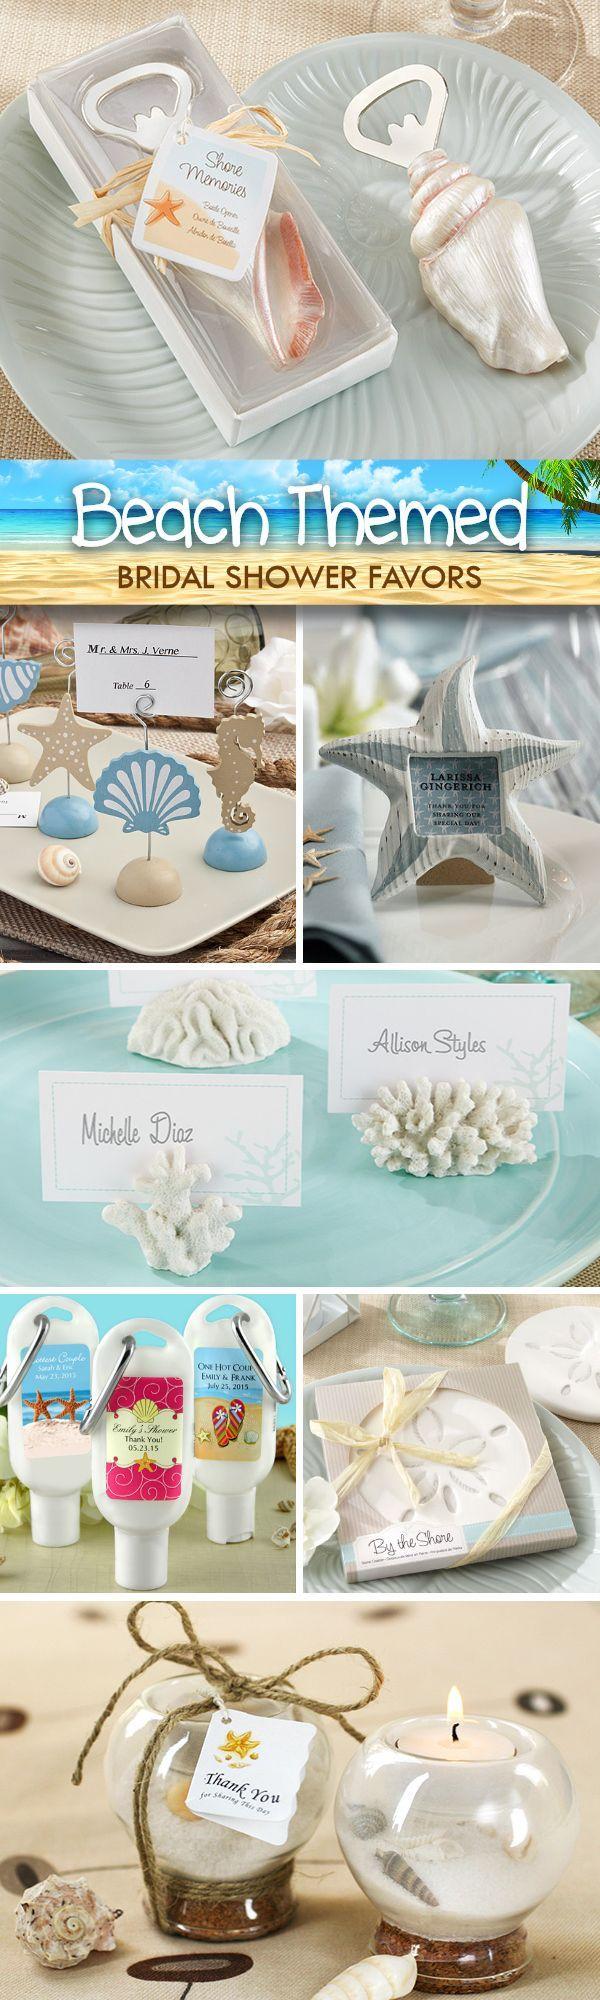 120 best Beach Wedding images on Pinterest   Beach weddings ...